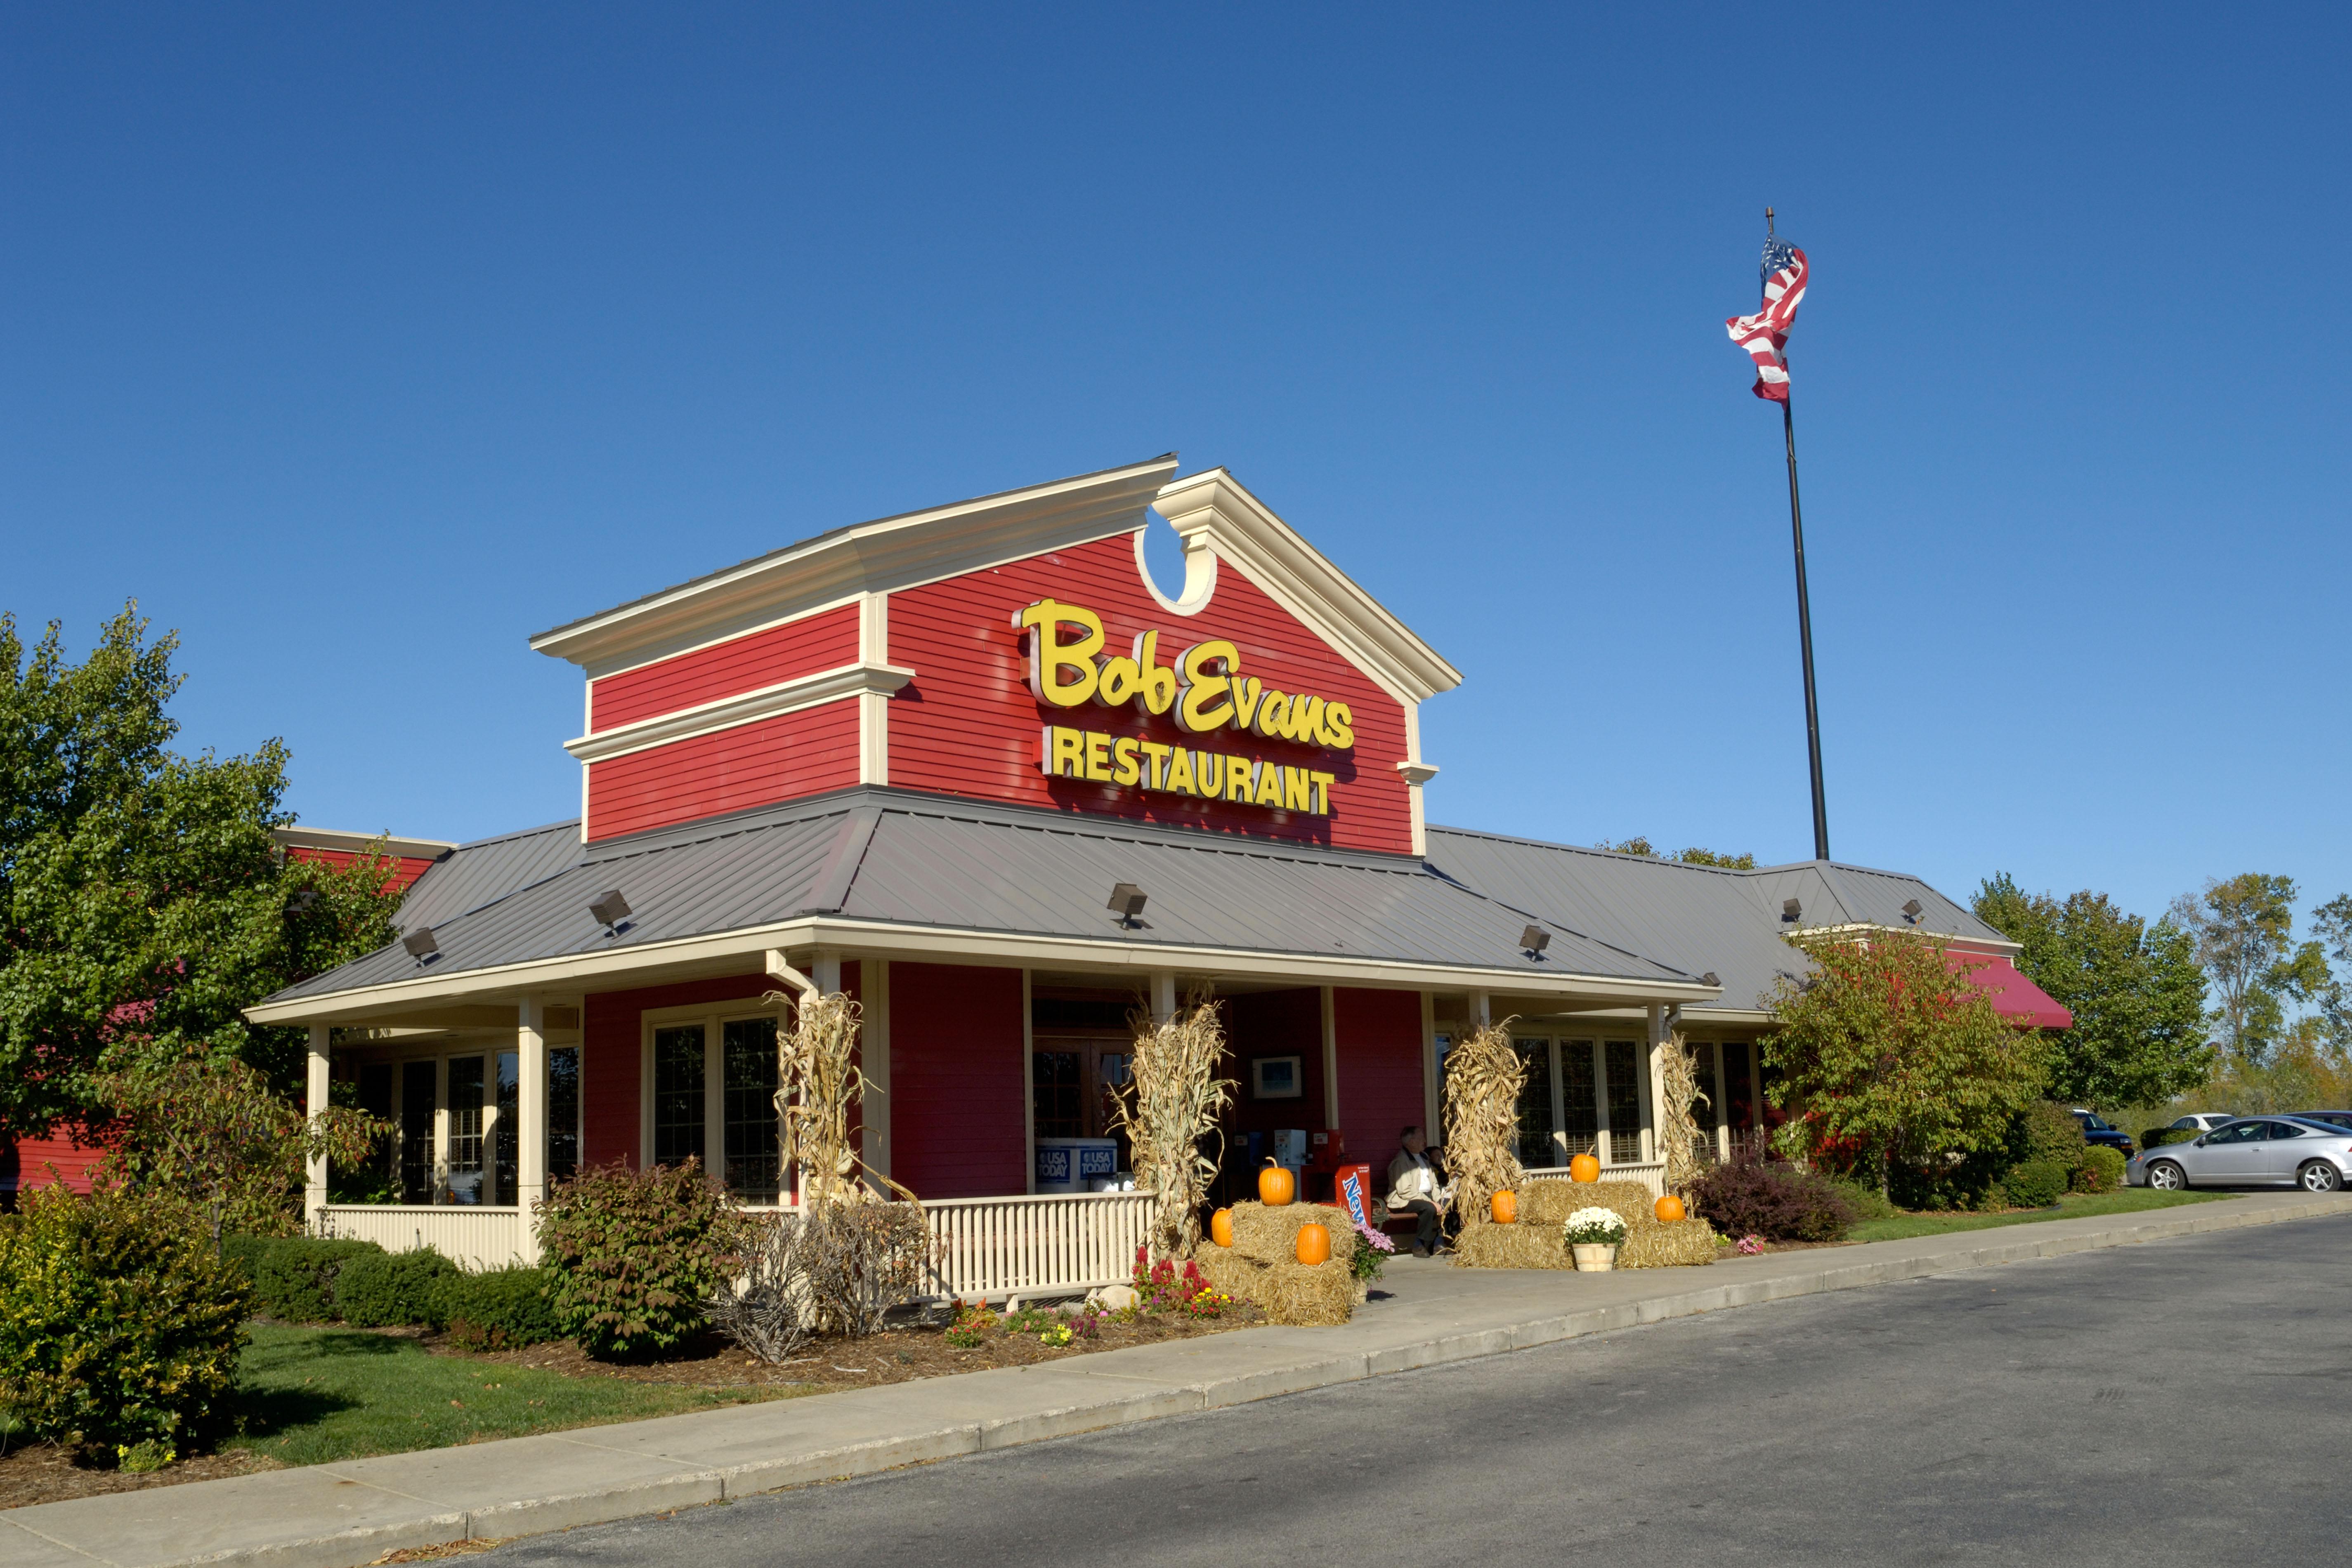 Bob Evans restaurant in Birch Run Michigan USA